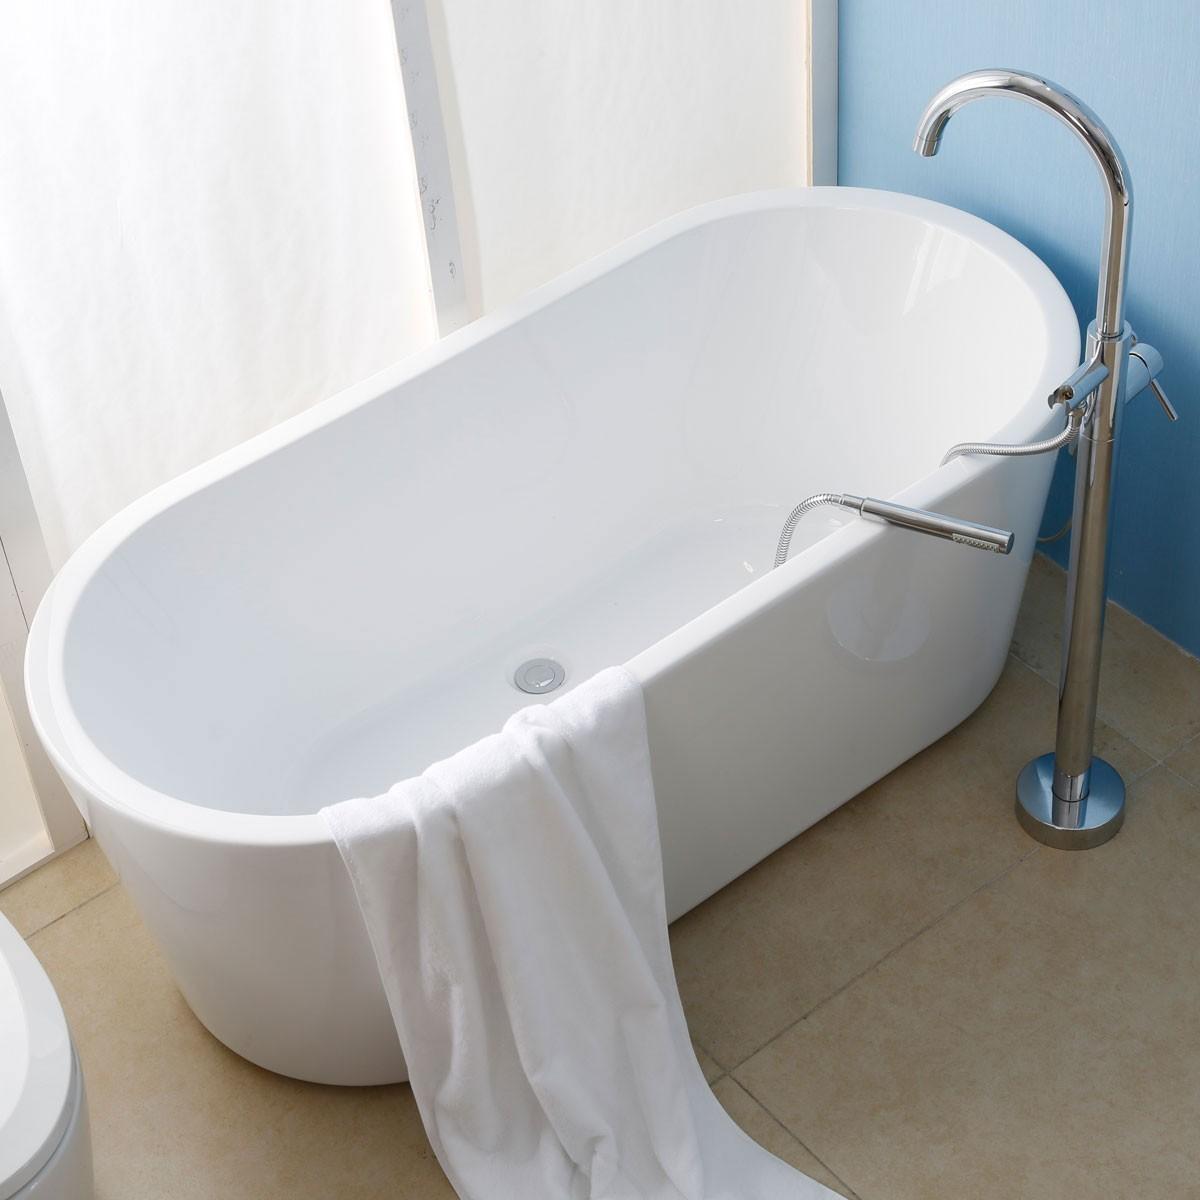 65 In Seamless Acrylic Freestanding Bathtub (DK-AT-1681W)